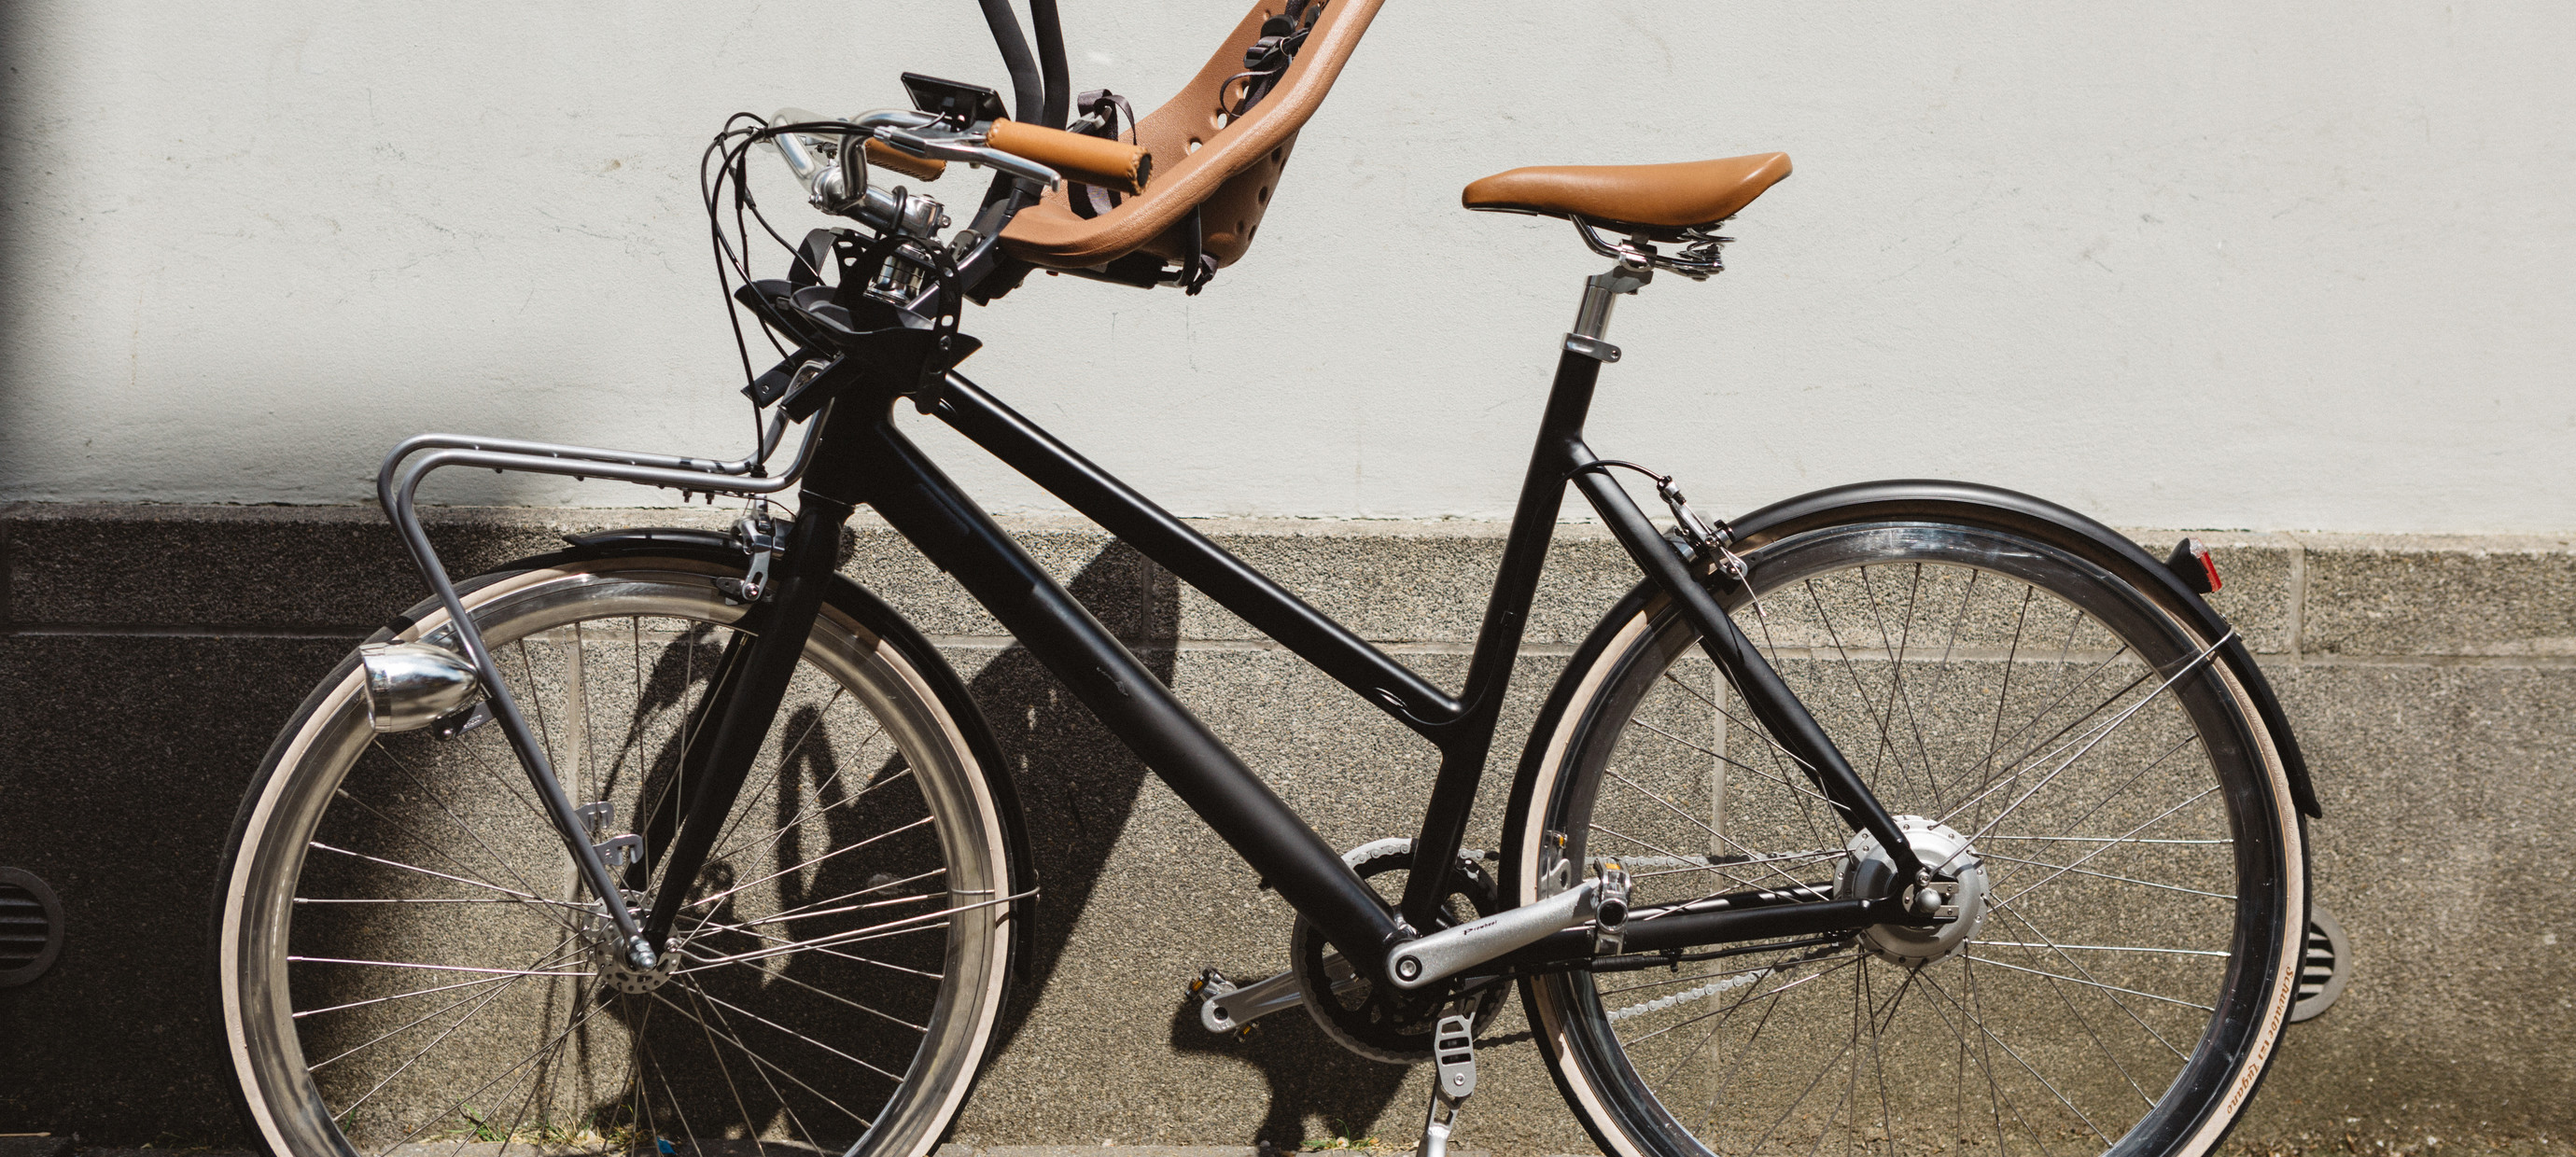 Dit is waarom een WATT e-bike óók ideaal is voor ouders